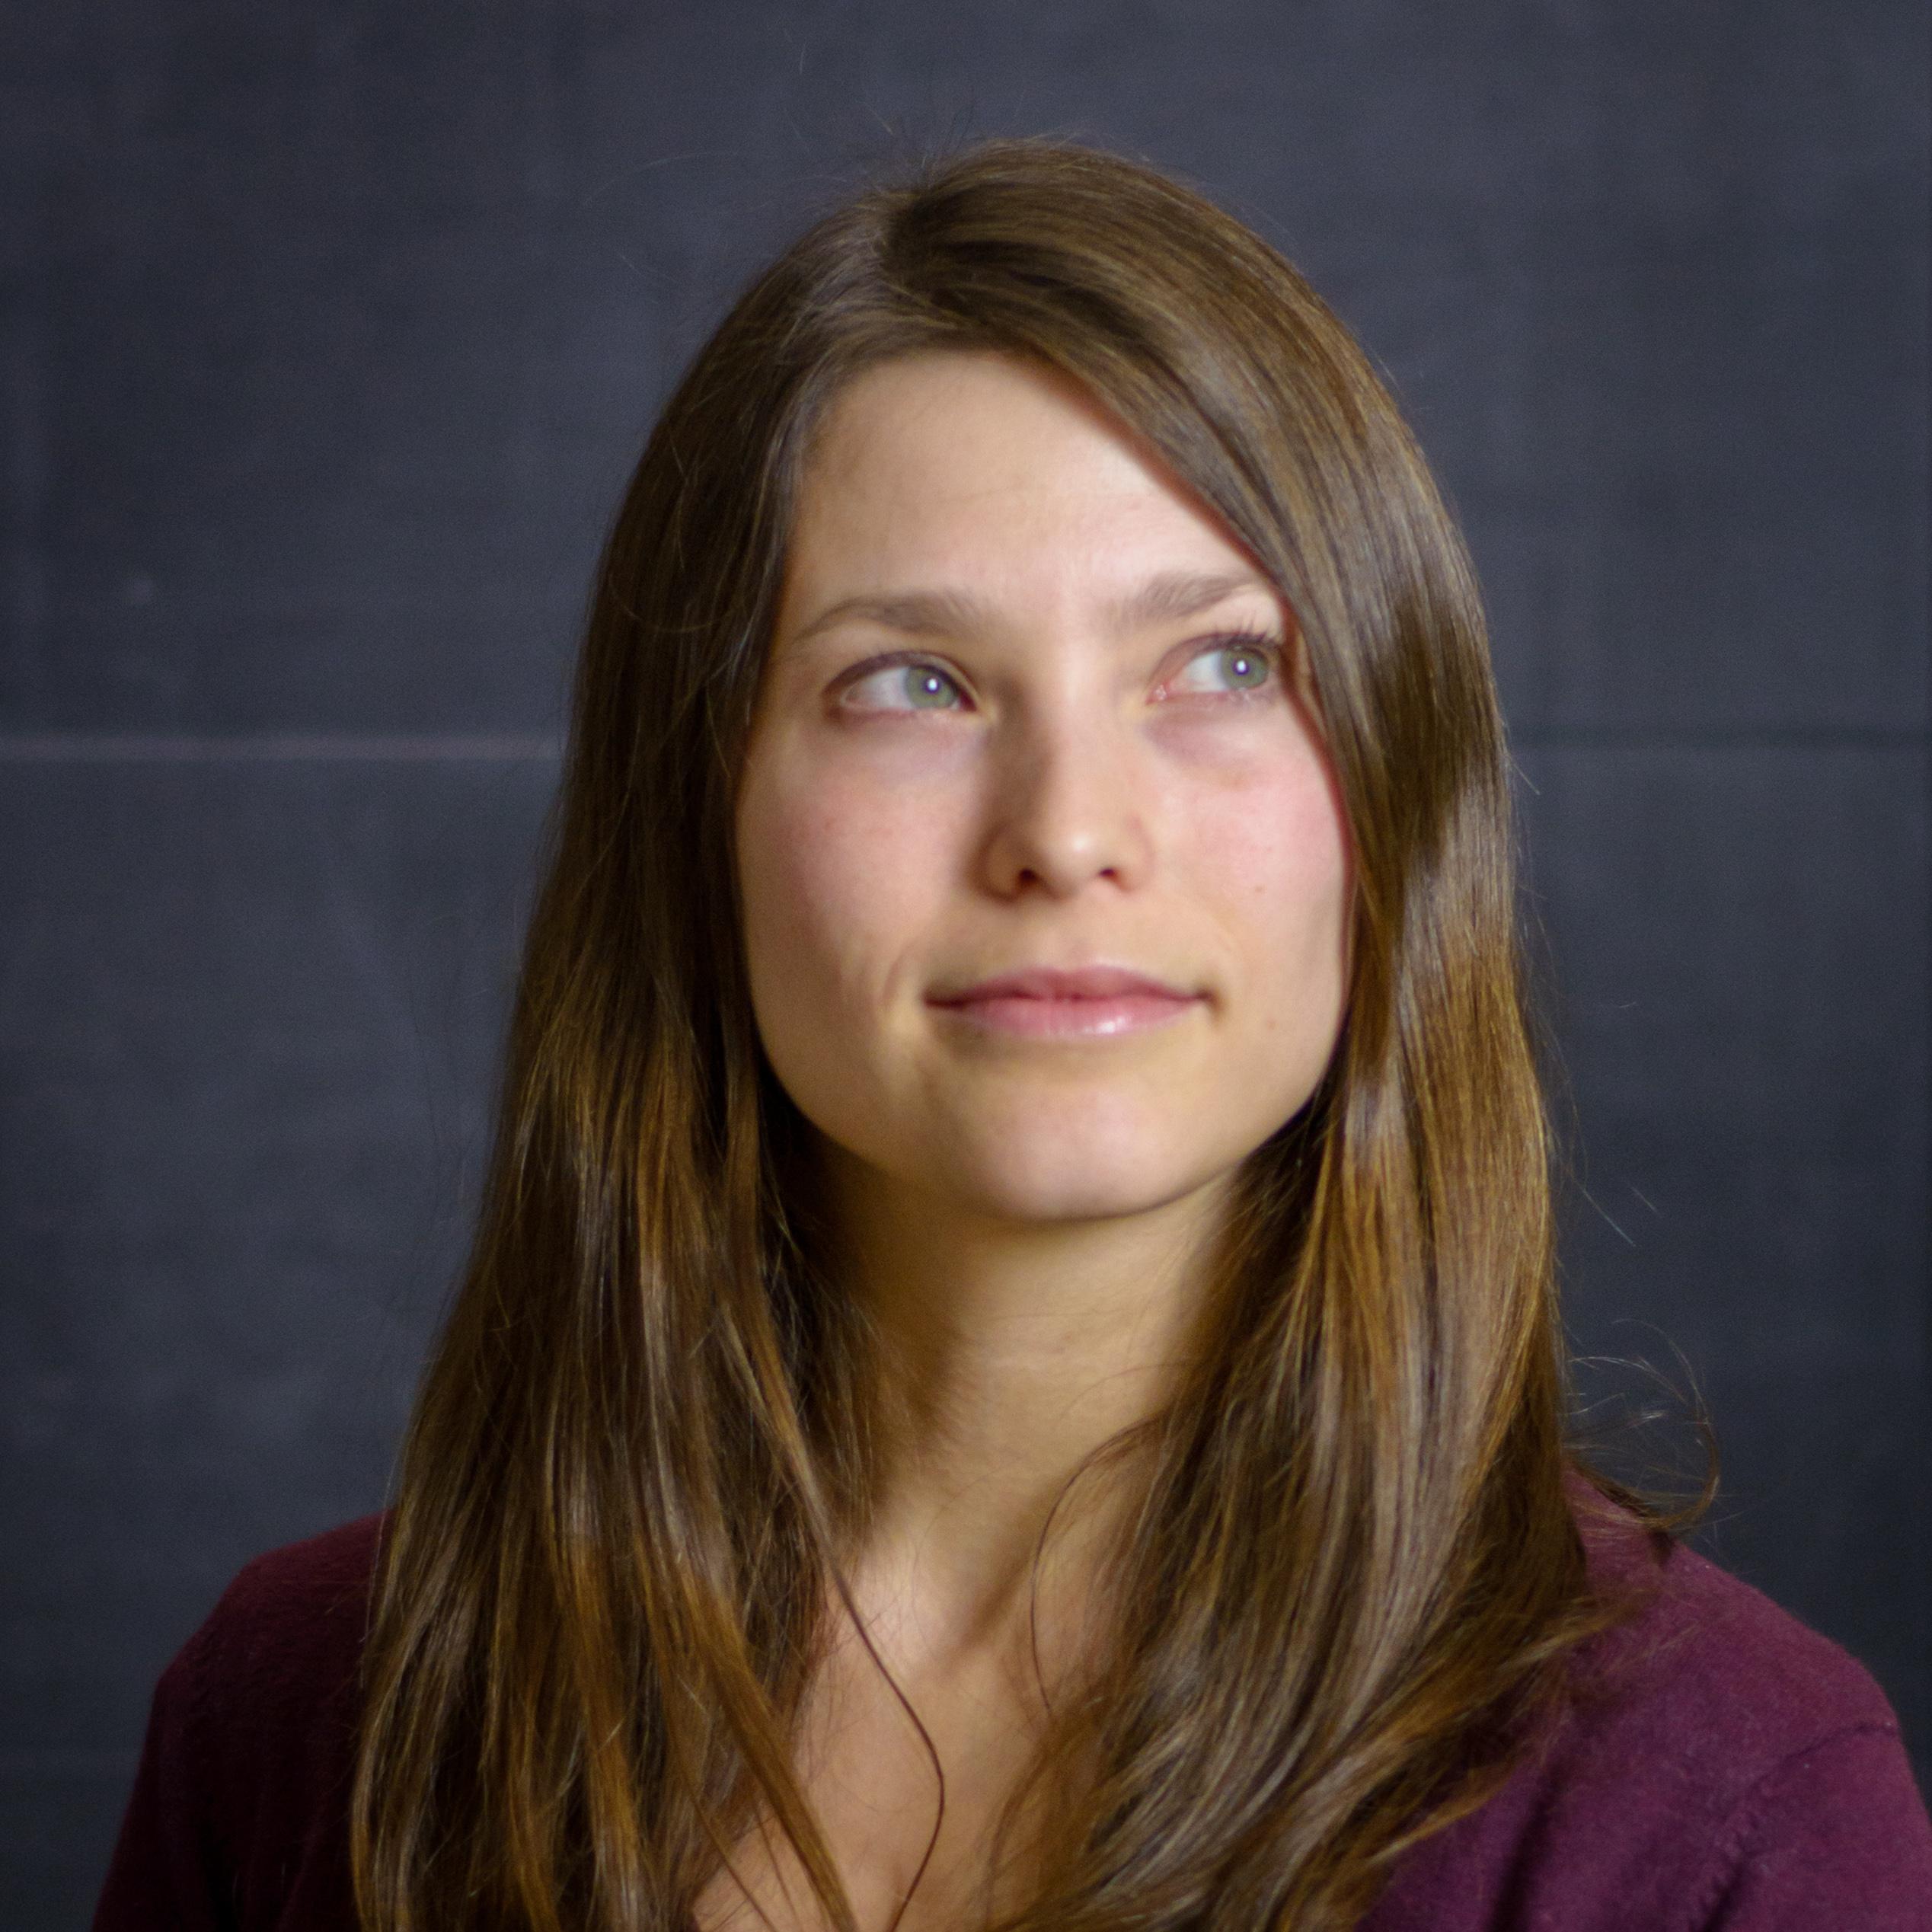 Hanne Stensola